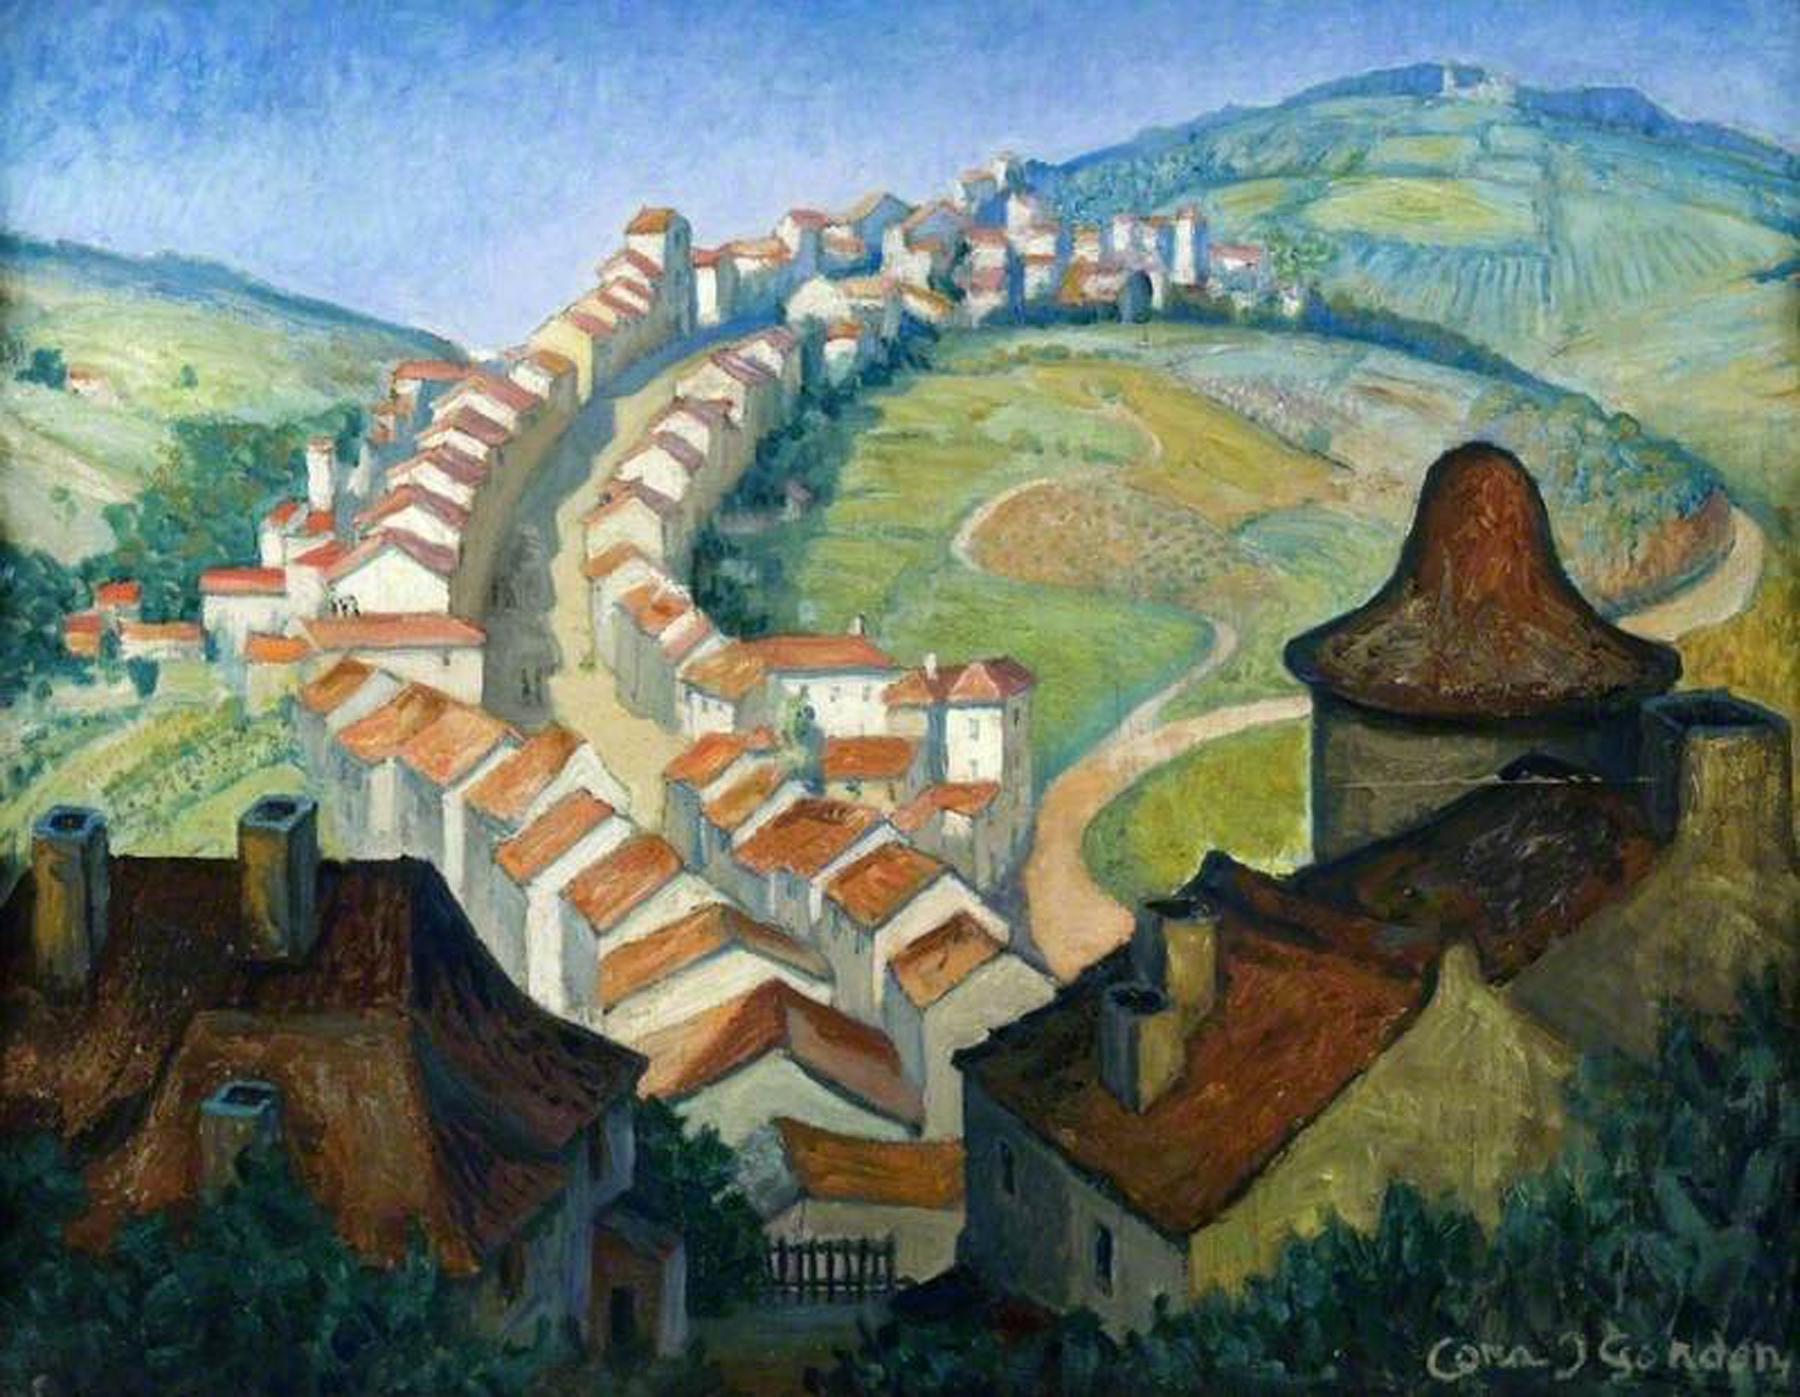 Gordon, Cora Josephine, 1879-1950; France: The Village on the Hills